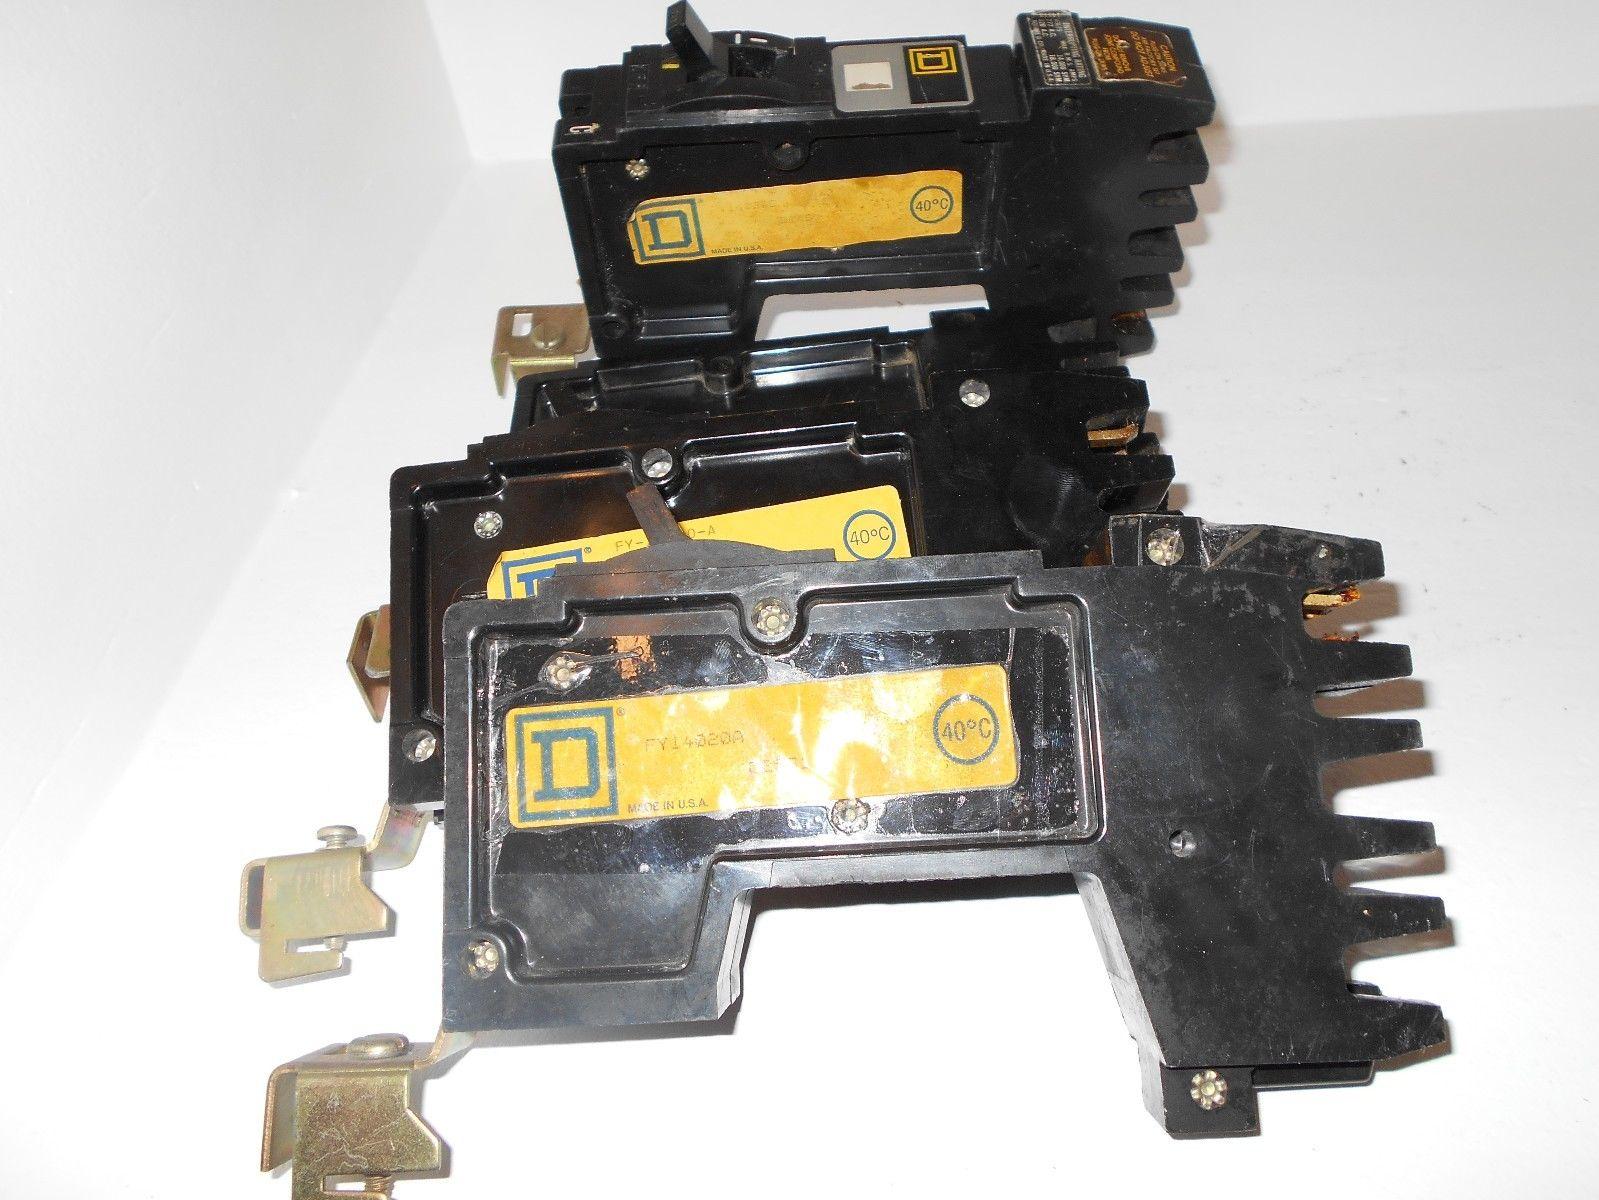 New Lot Of 4 Square D Fy14020 1 Pole 20 Amp 277 Volt I Line Circuit 25a Generator Breaker 10 Ebay